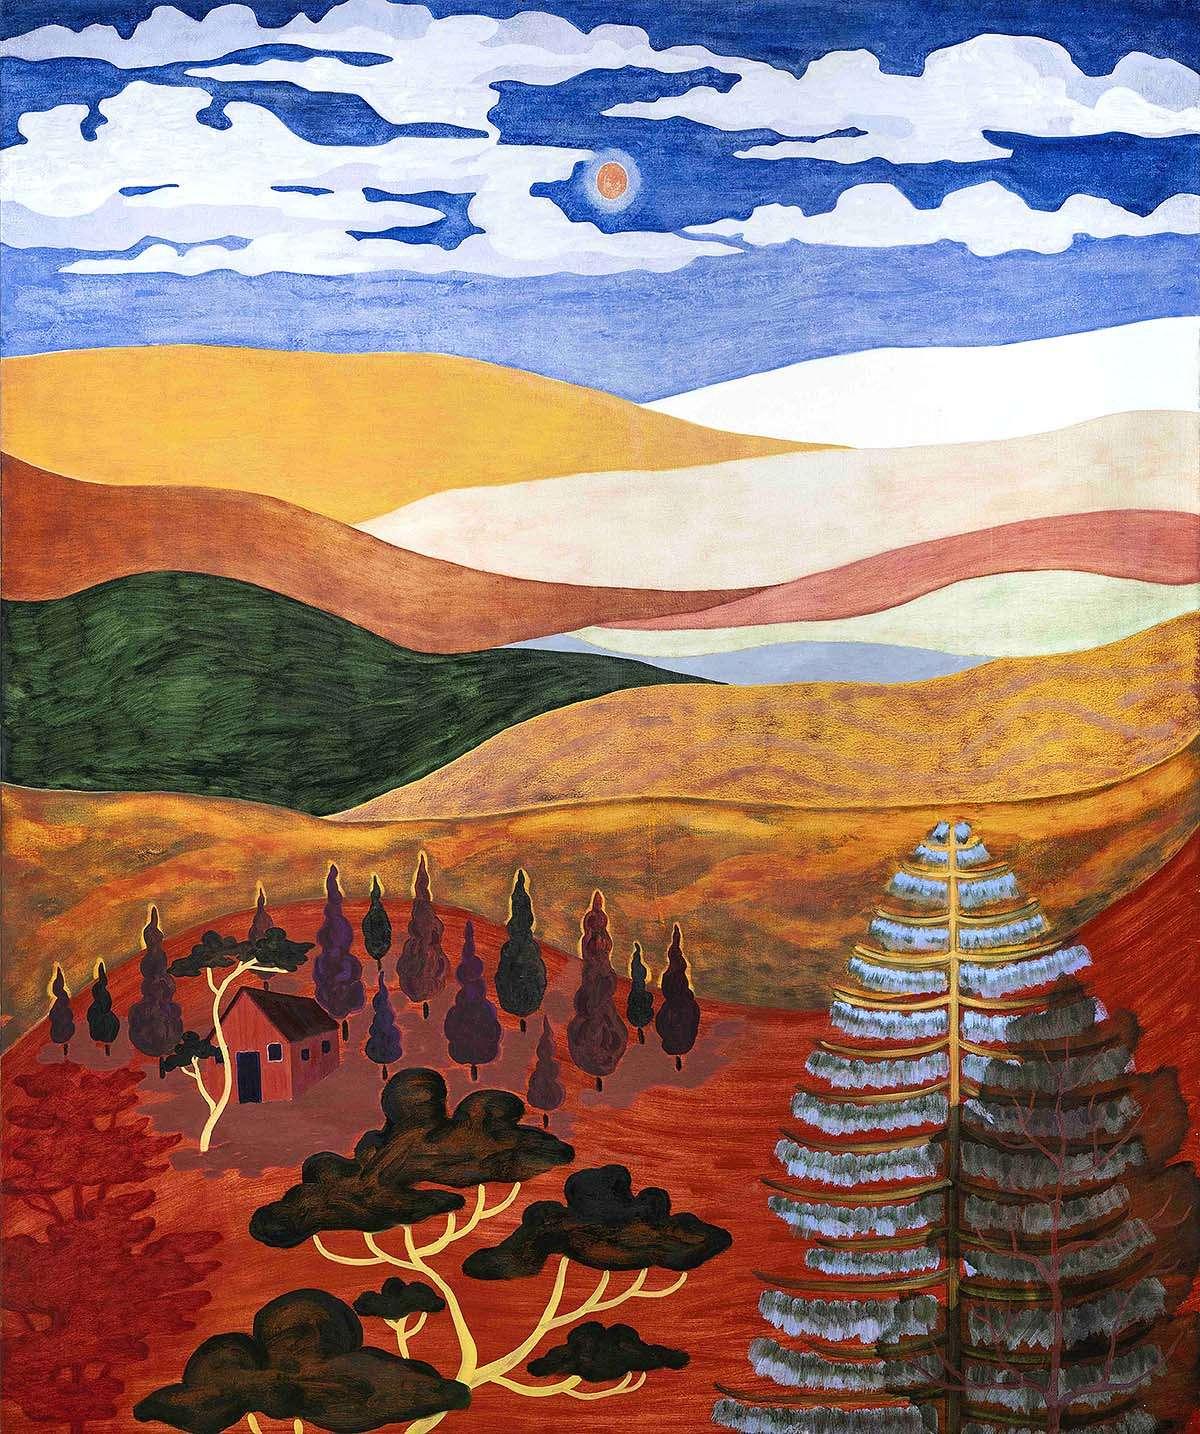 Freya Douglas-Morris, 'Hills of Honey', oil on canvas